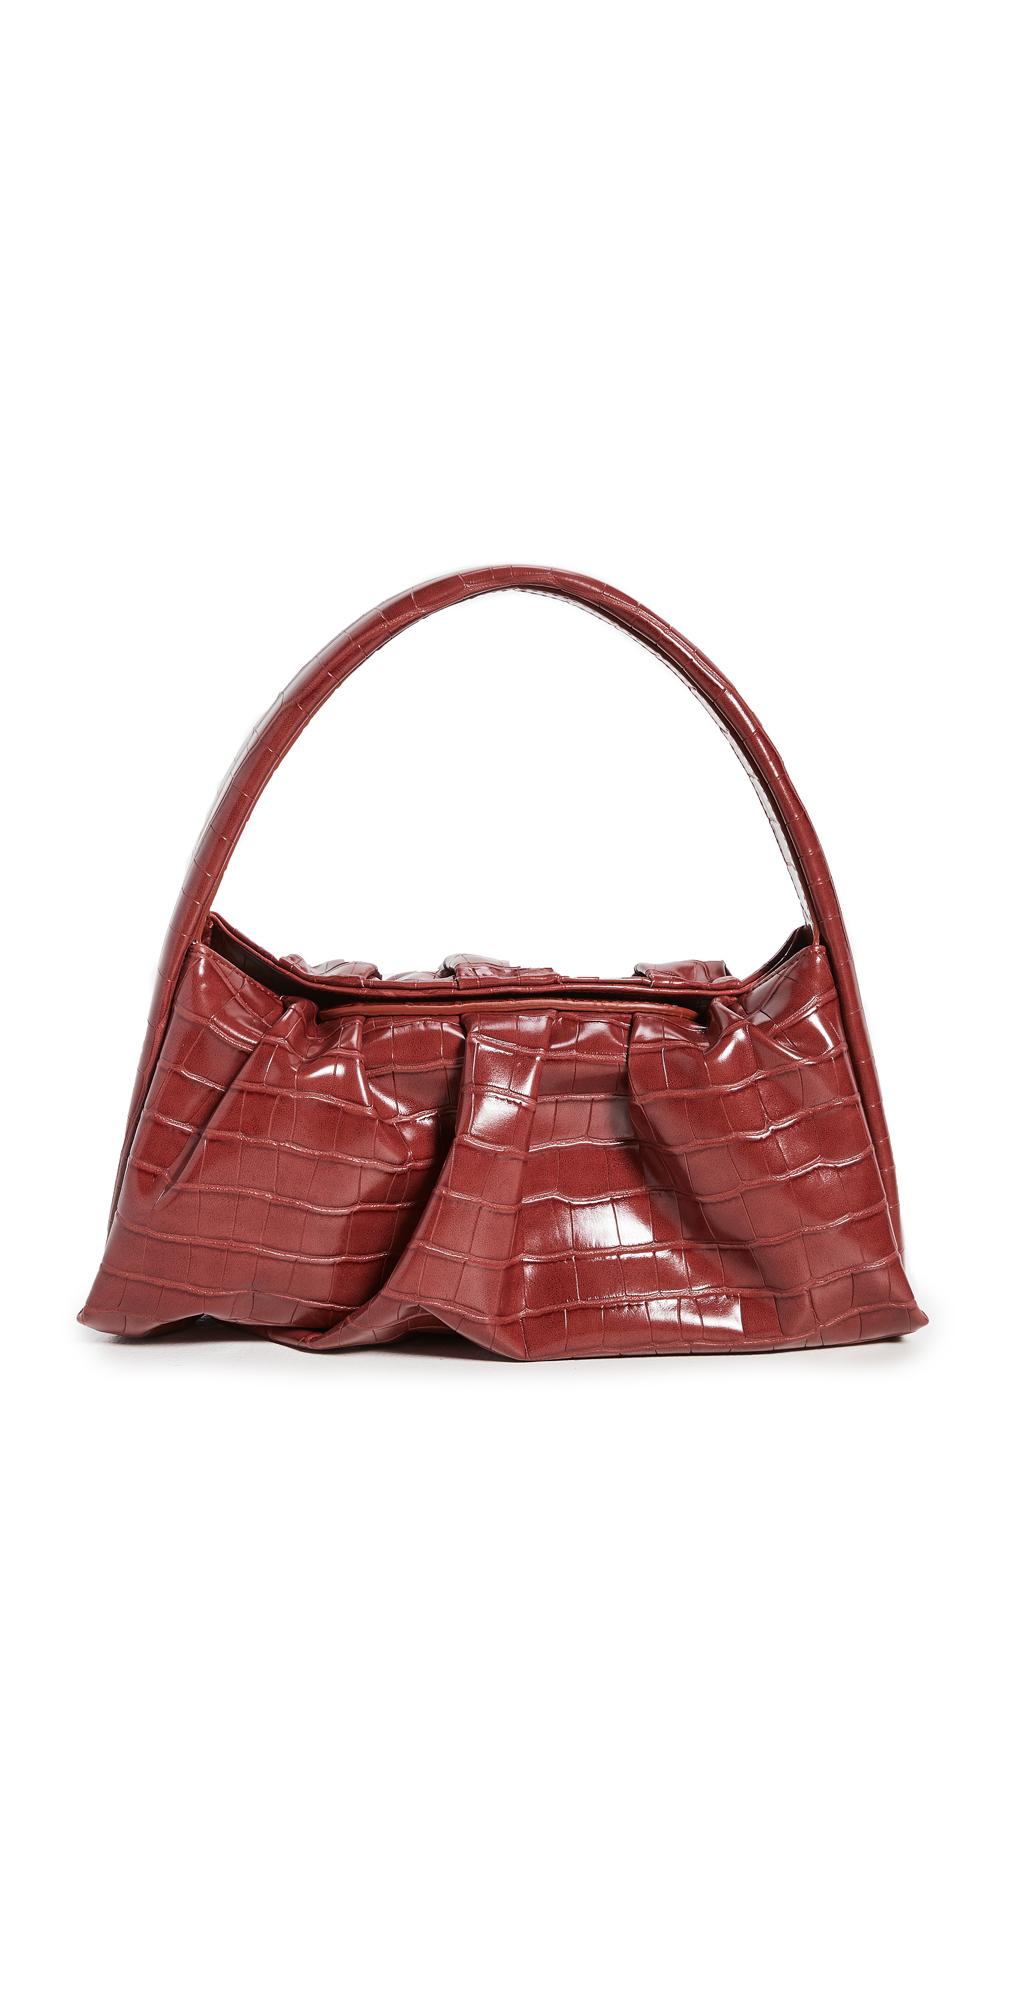 Themoire Hera Croco Bag